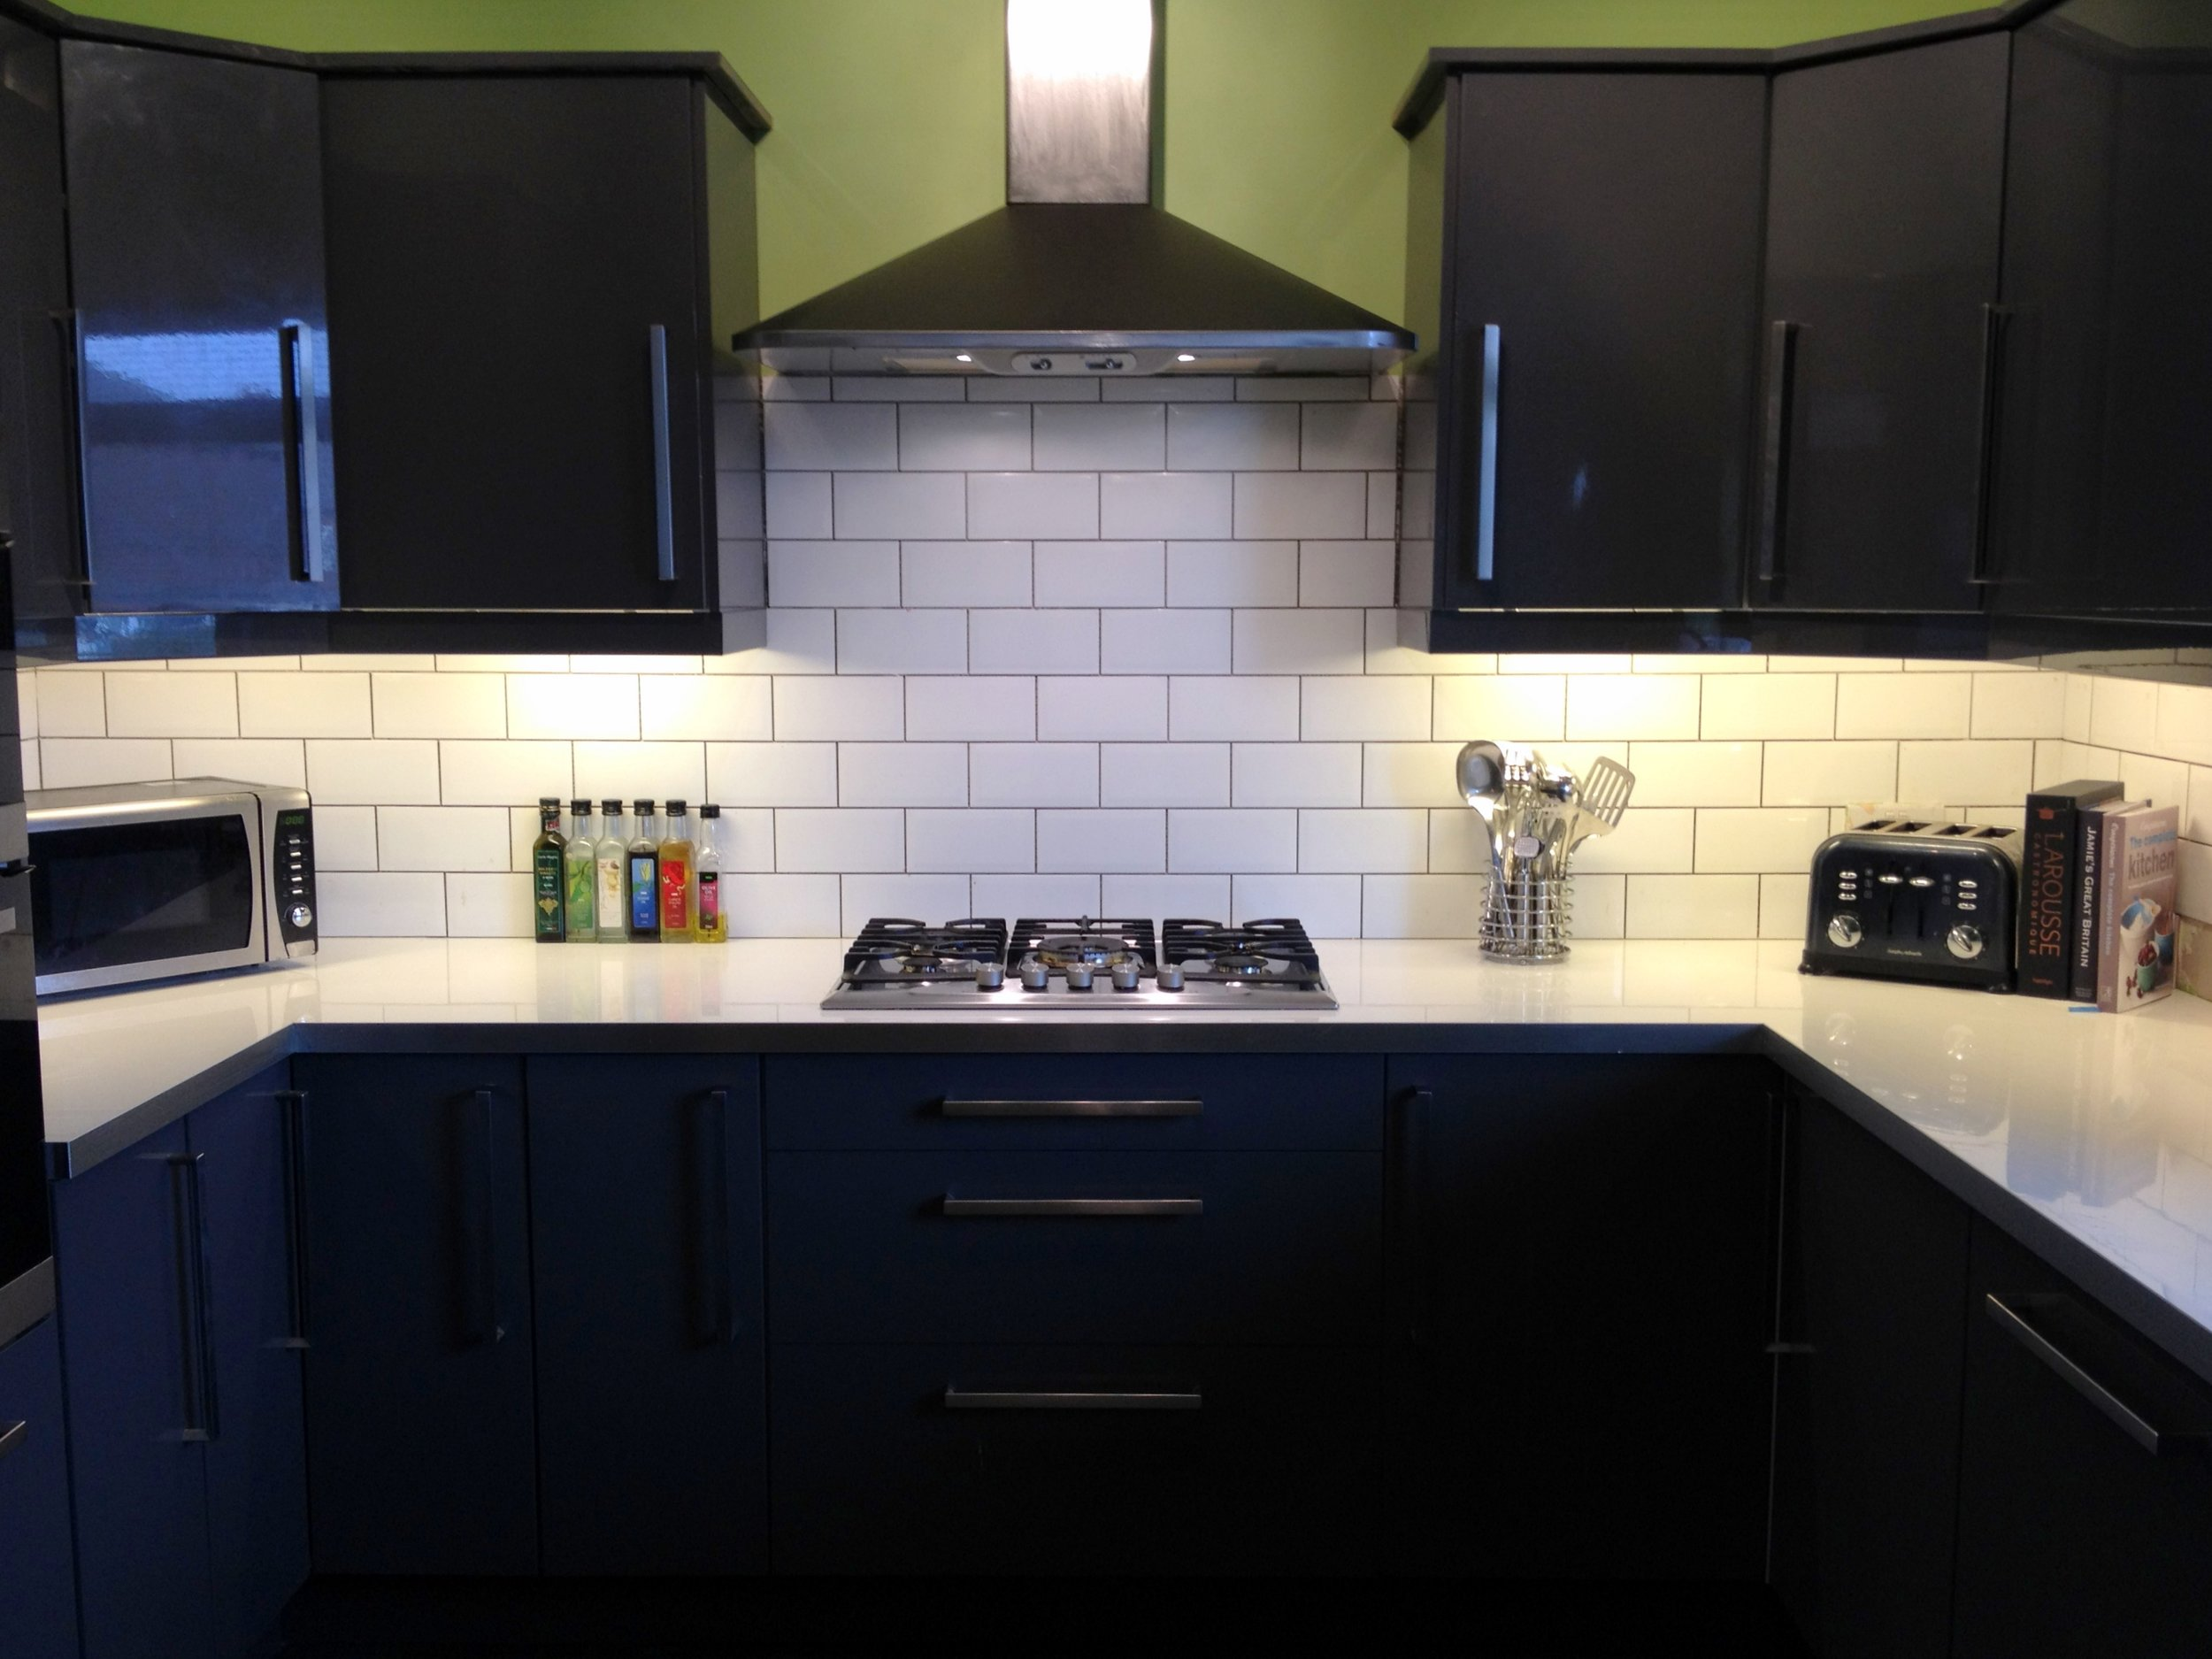 Modernisation of 80s kitchen - With internal structural demolition to create large kitchen diner